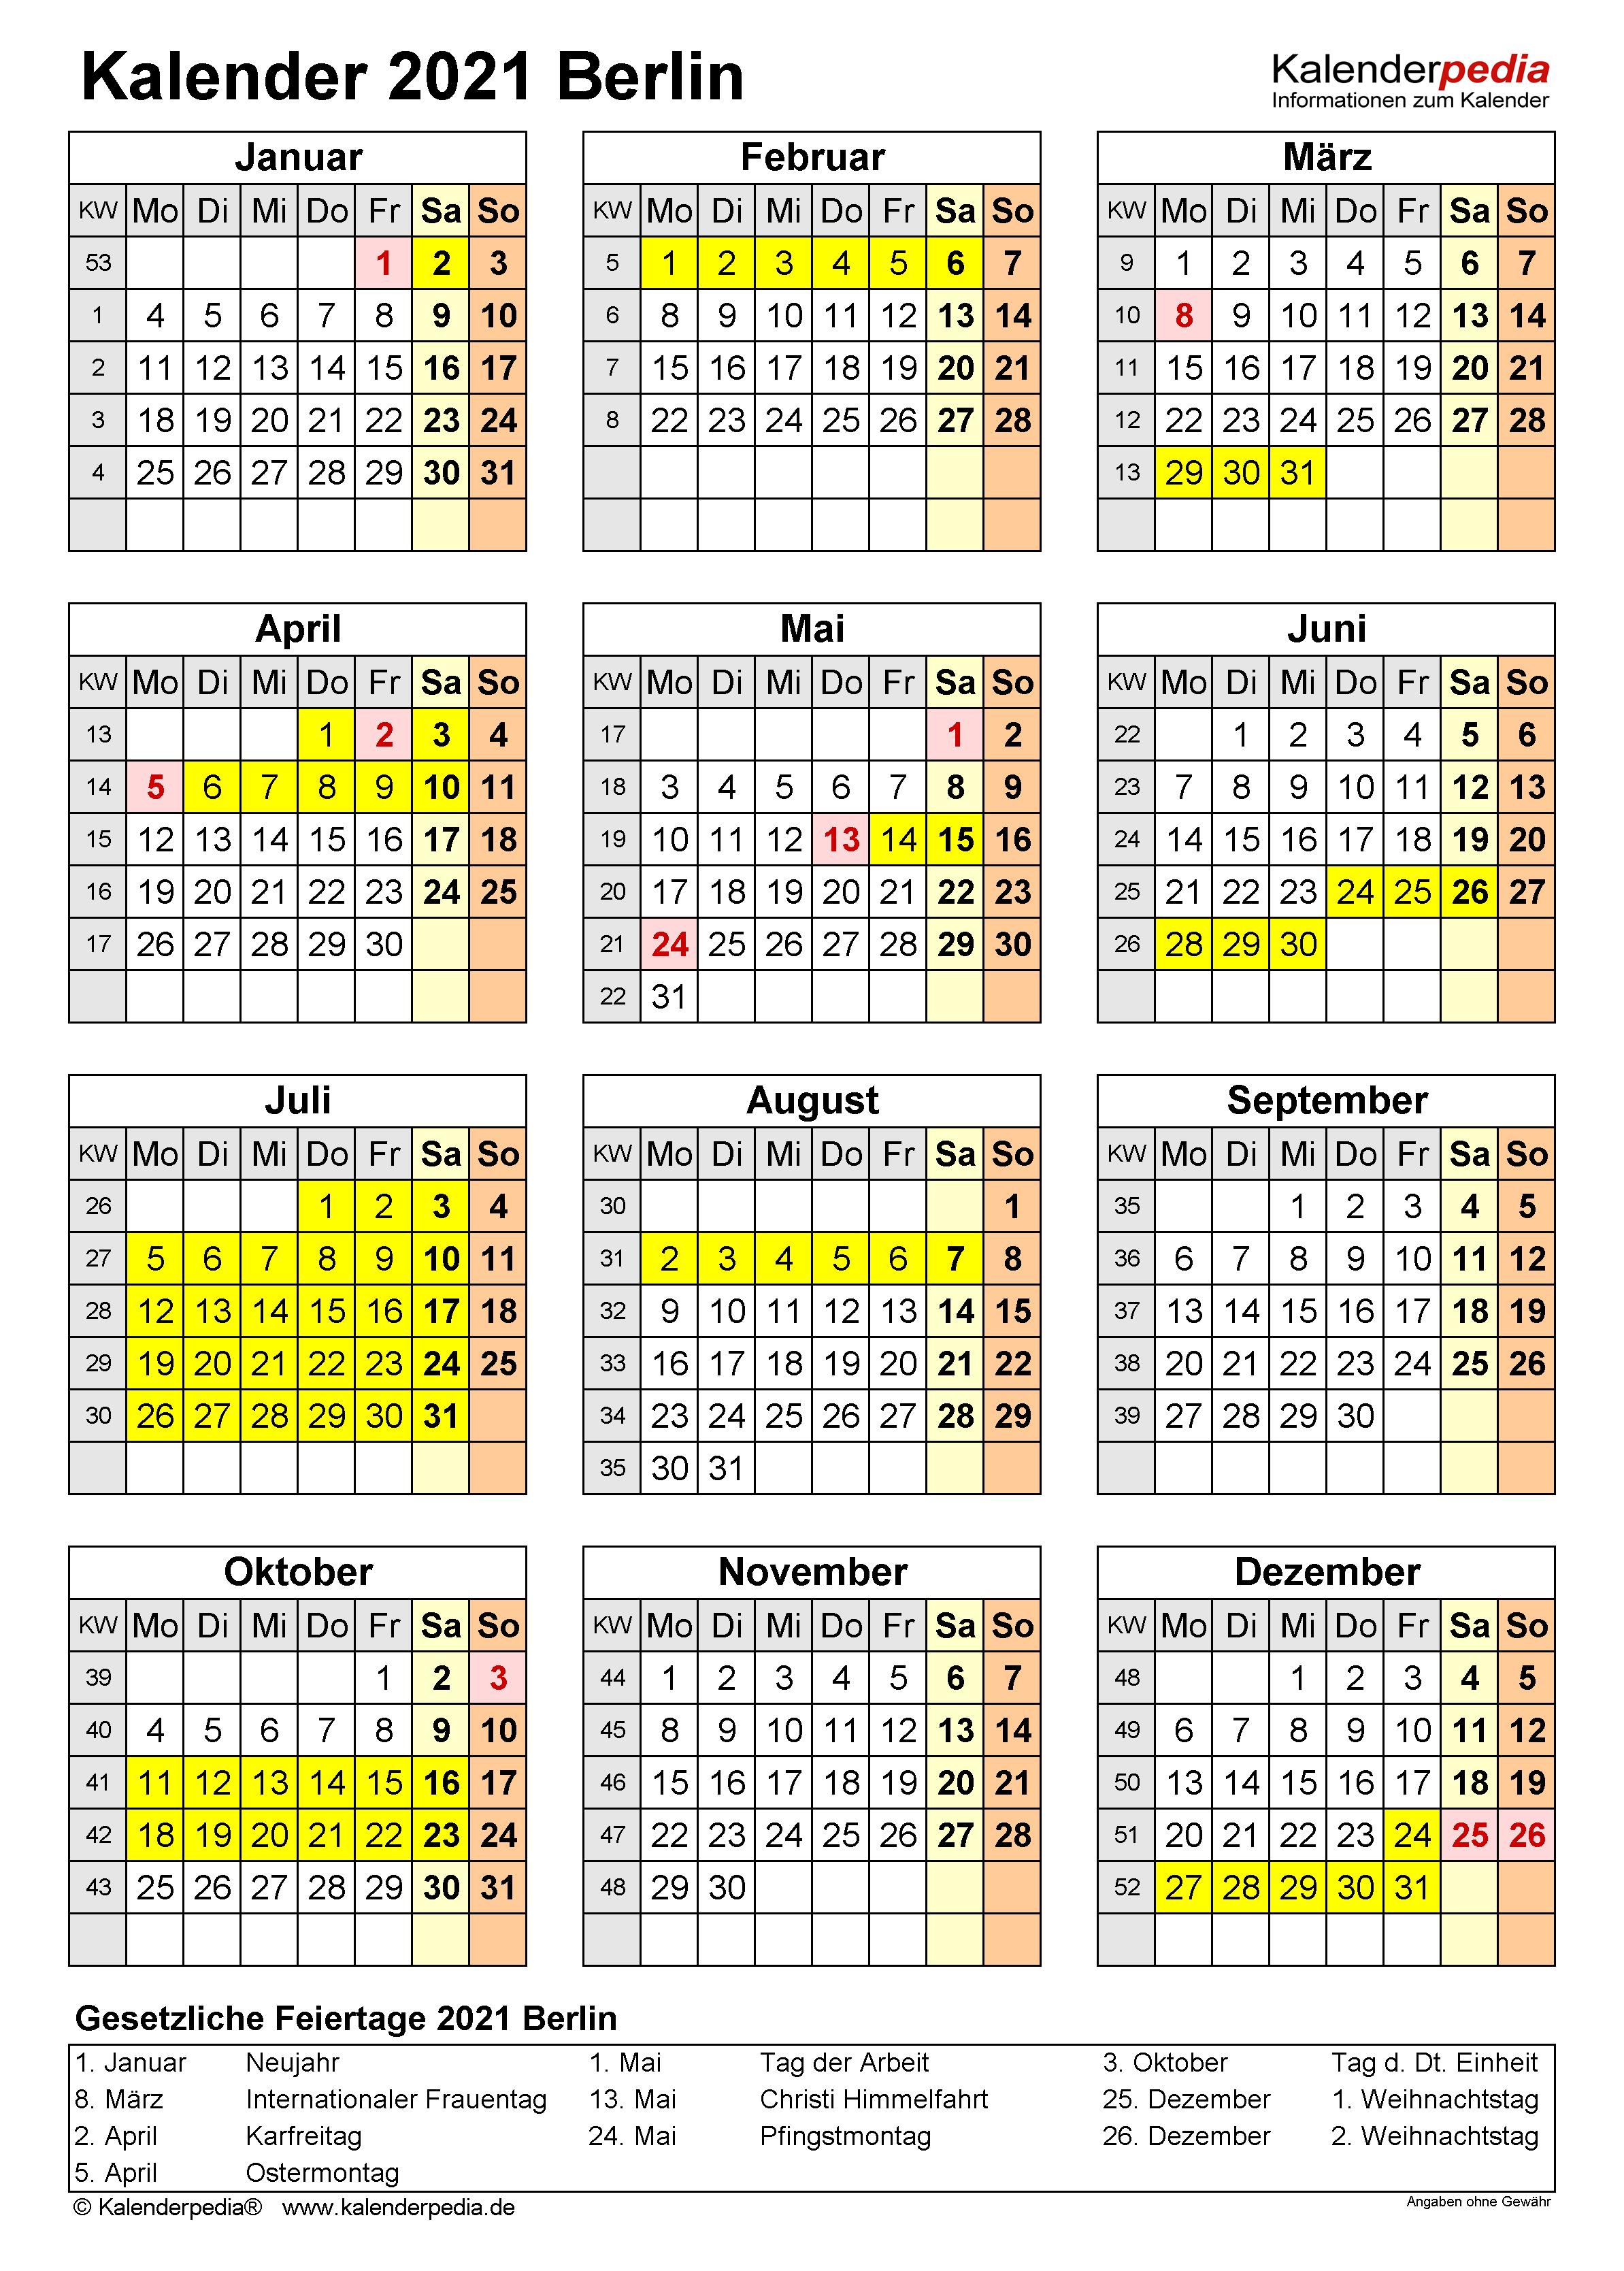 Kalender 2021 Mit Ferien Berlin